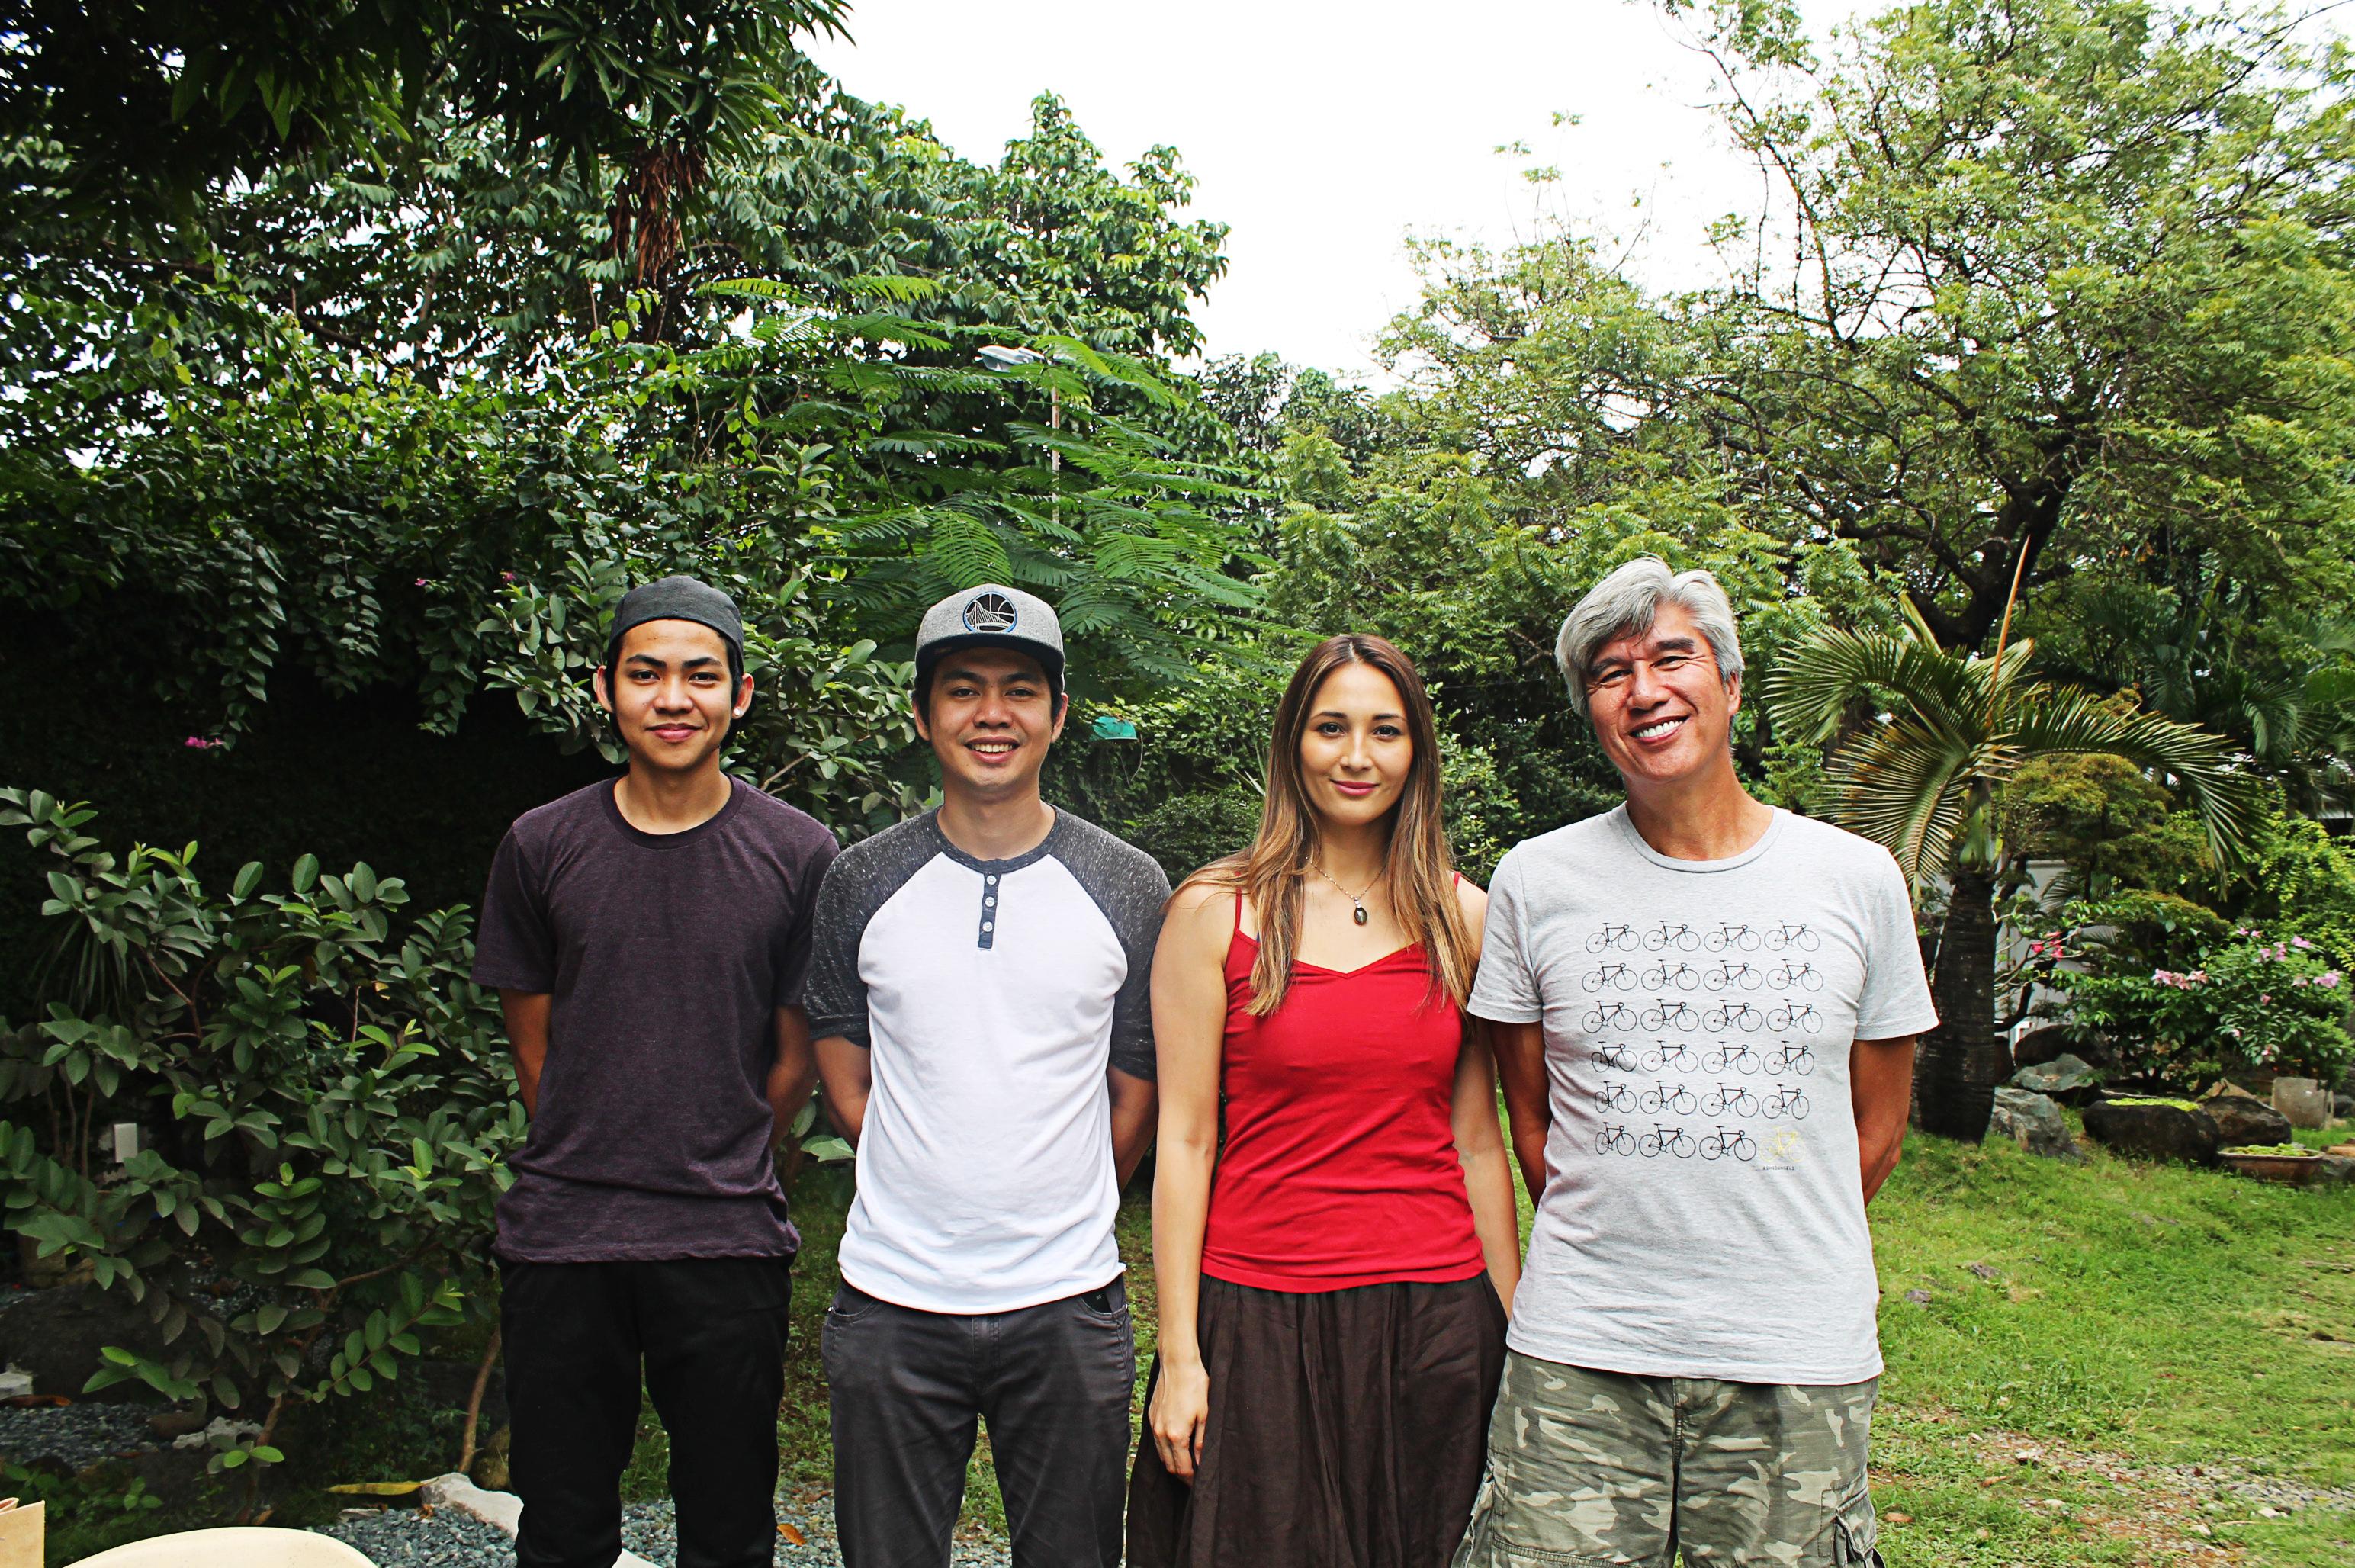 CW Music Filipino teachers Aldrix Aniceto, Allen Aniceto, Christine White and Joel Uichico, founder of Bikes for the Philippines